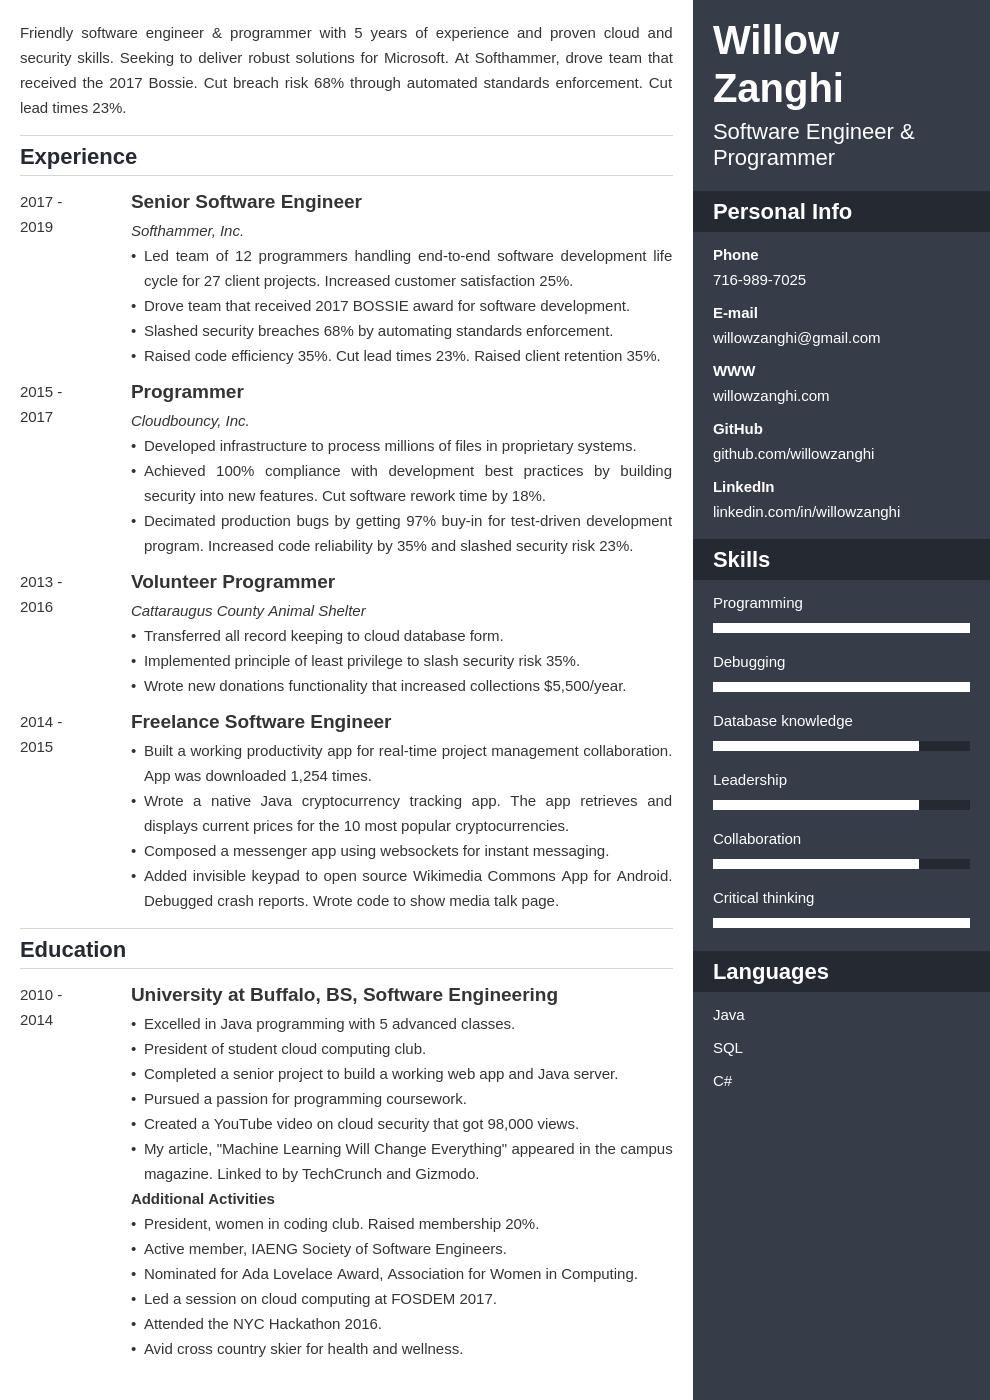 resume chronological template enfold